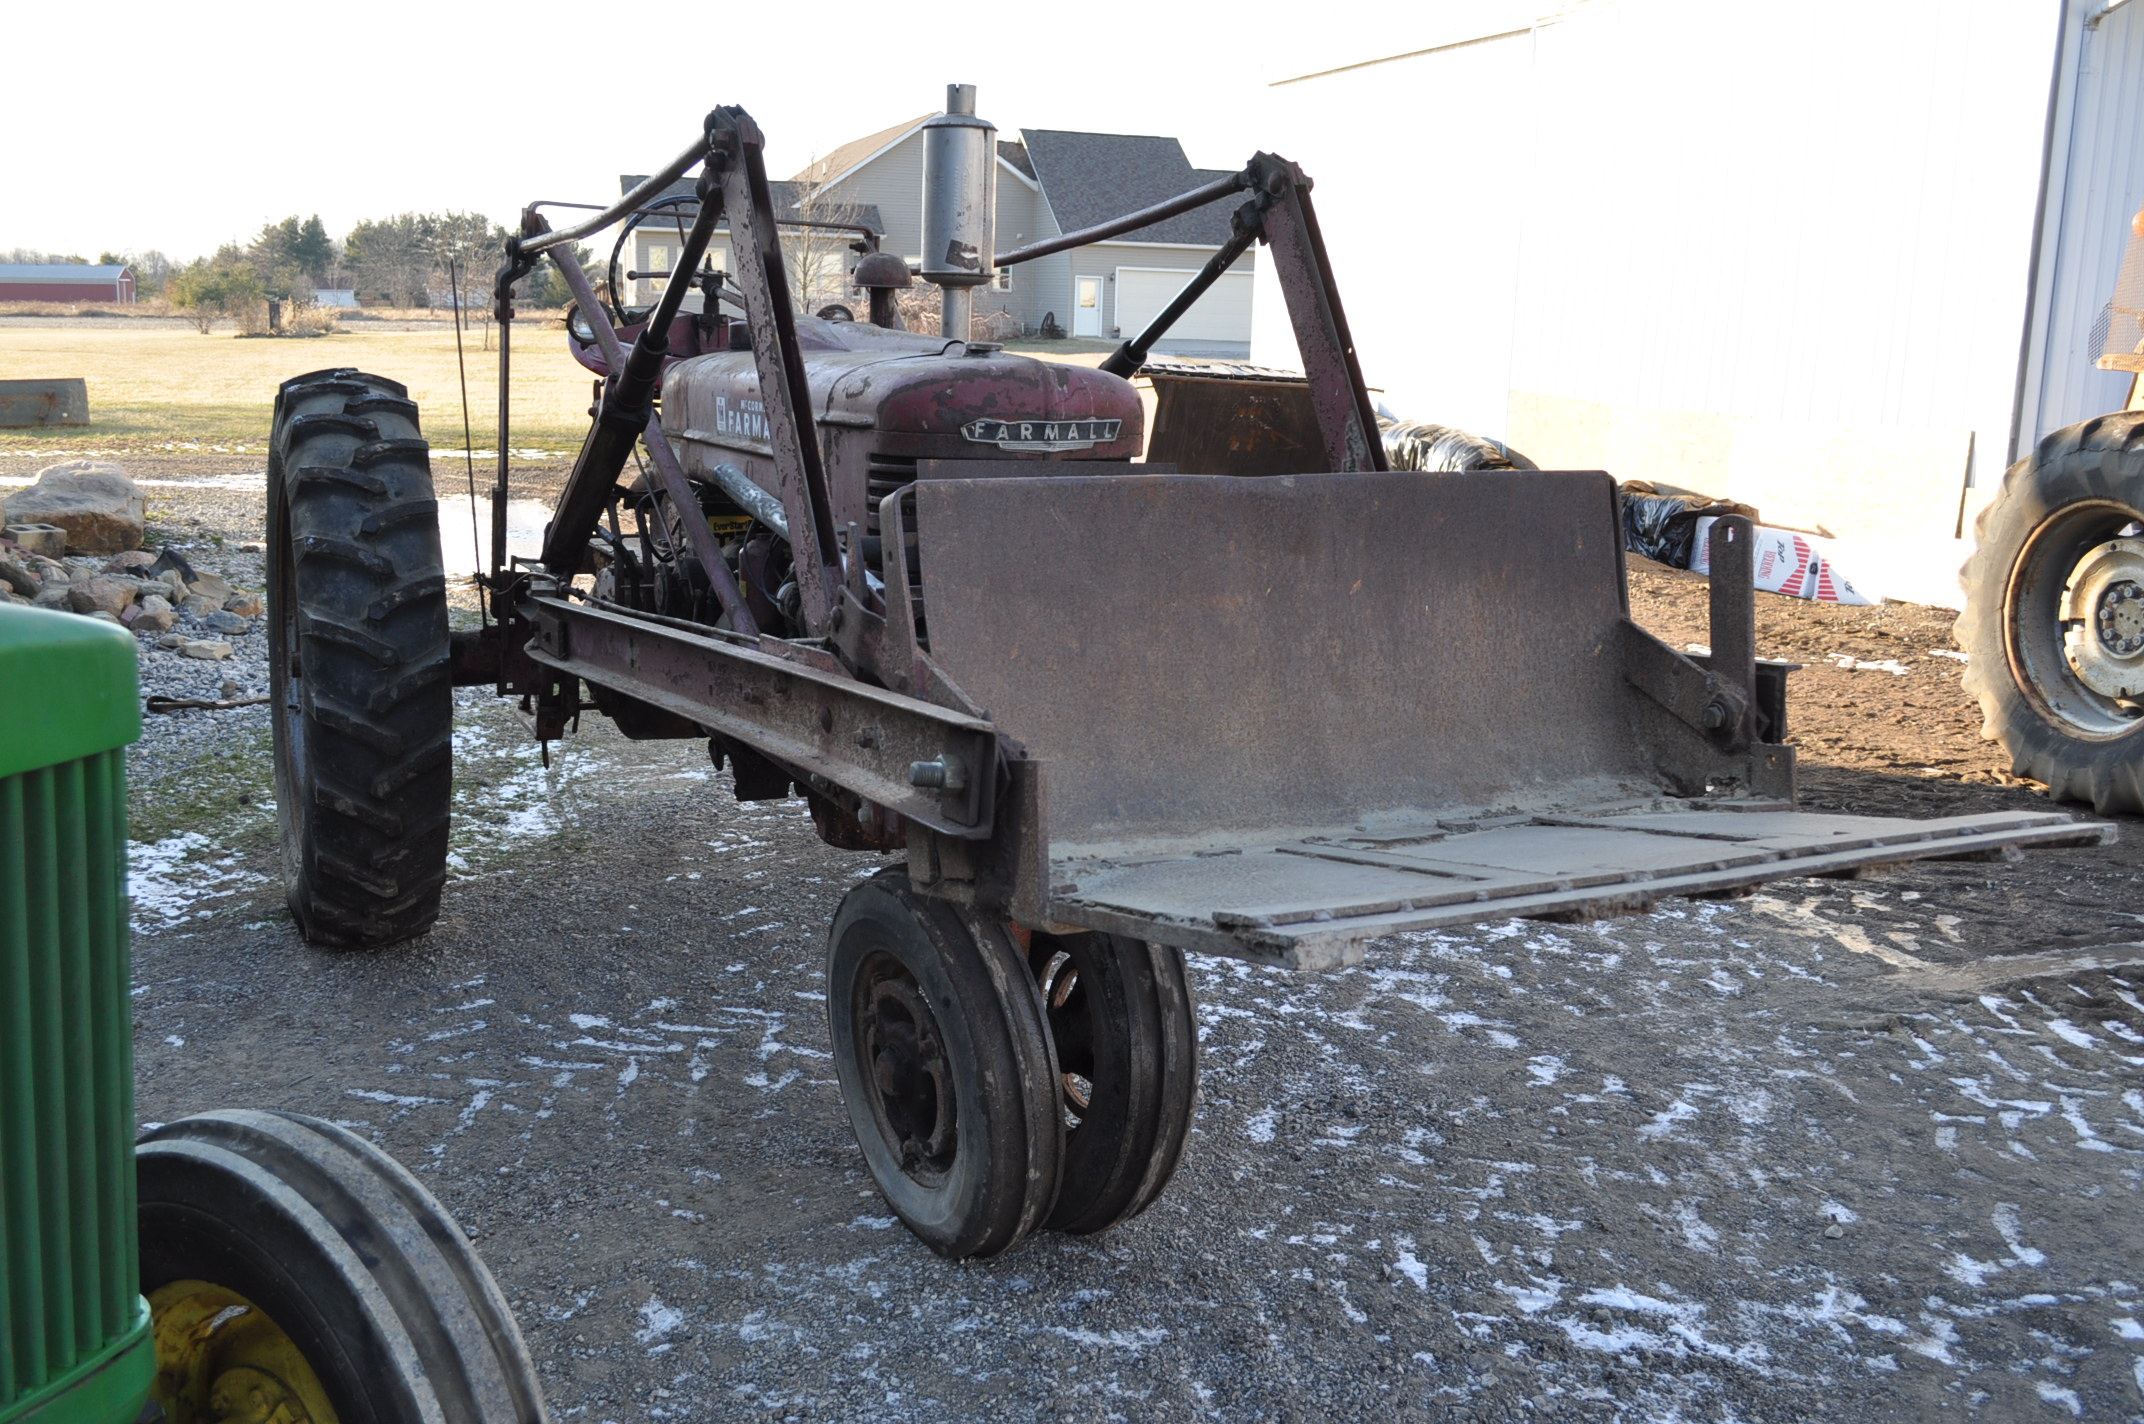 Farmall M tractor, 13.6-38 rear, narrow front, gasoline, loader, 540 PTO, SN FBK276 - Image 4 of 11